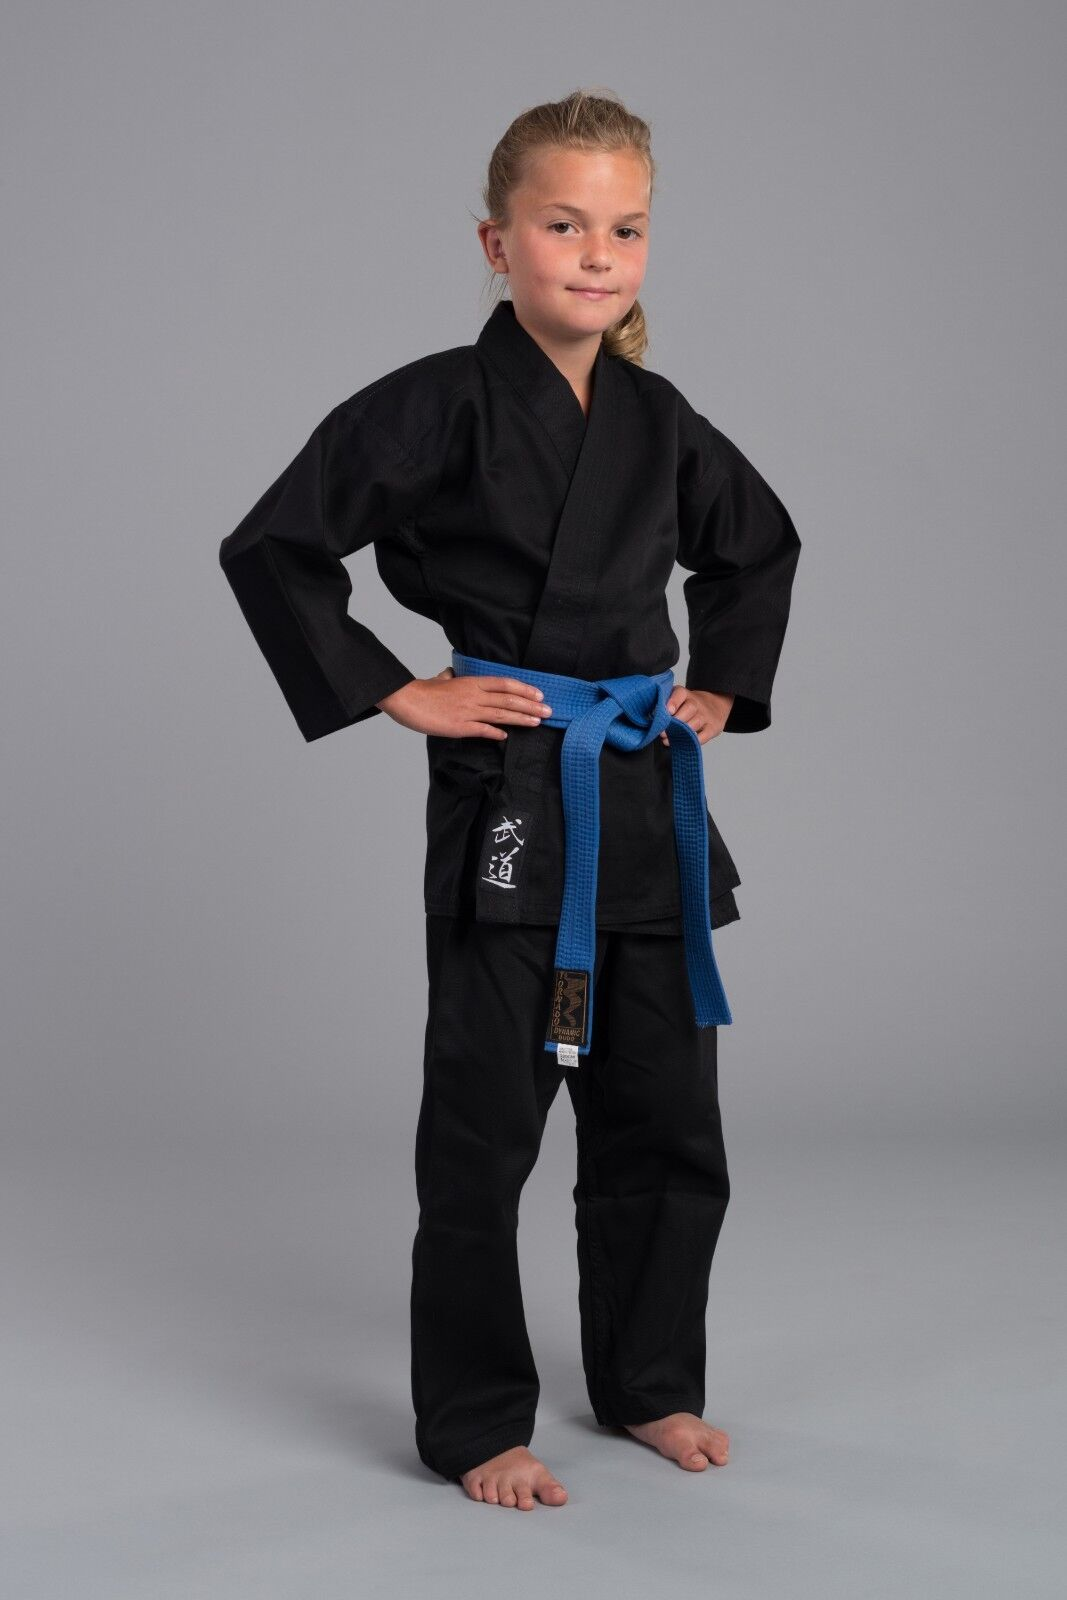 Karate-Anzug schwarz STANDARD STANDARD STANDARD EDITION für Karate SV, Ju Jutsu 813e64